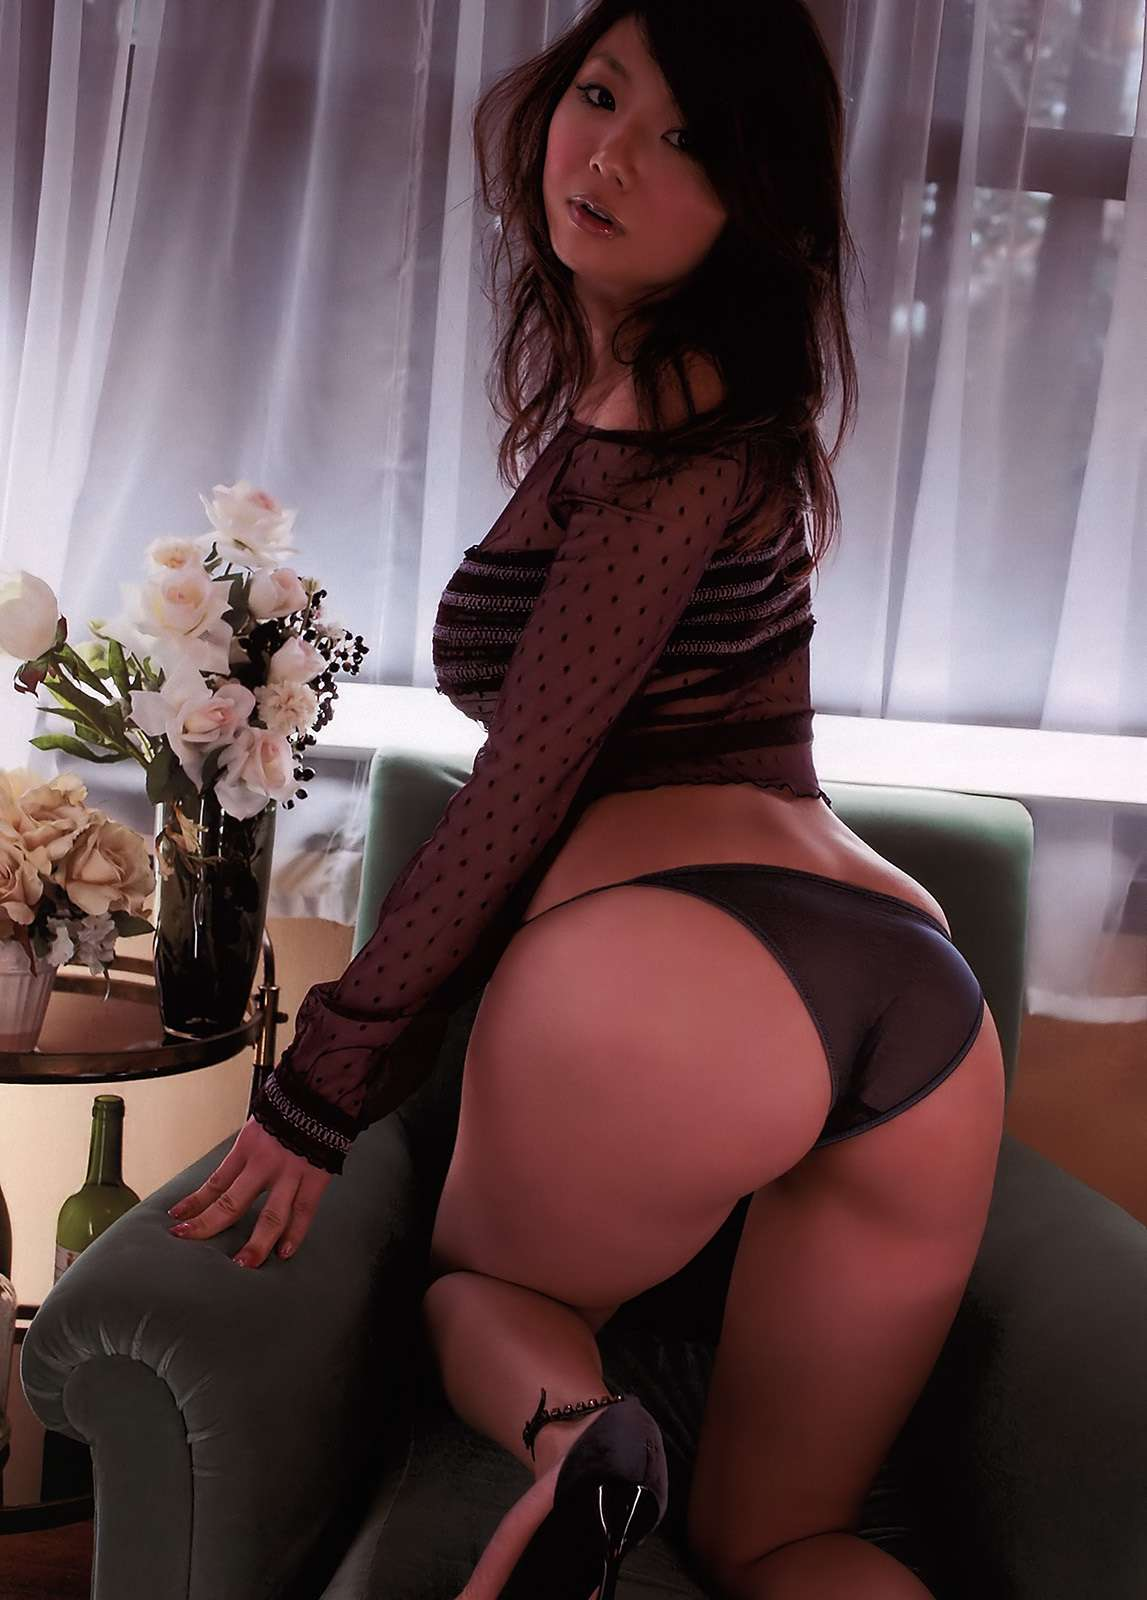 Stripper Doing Porn Interview